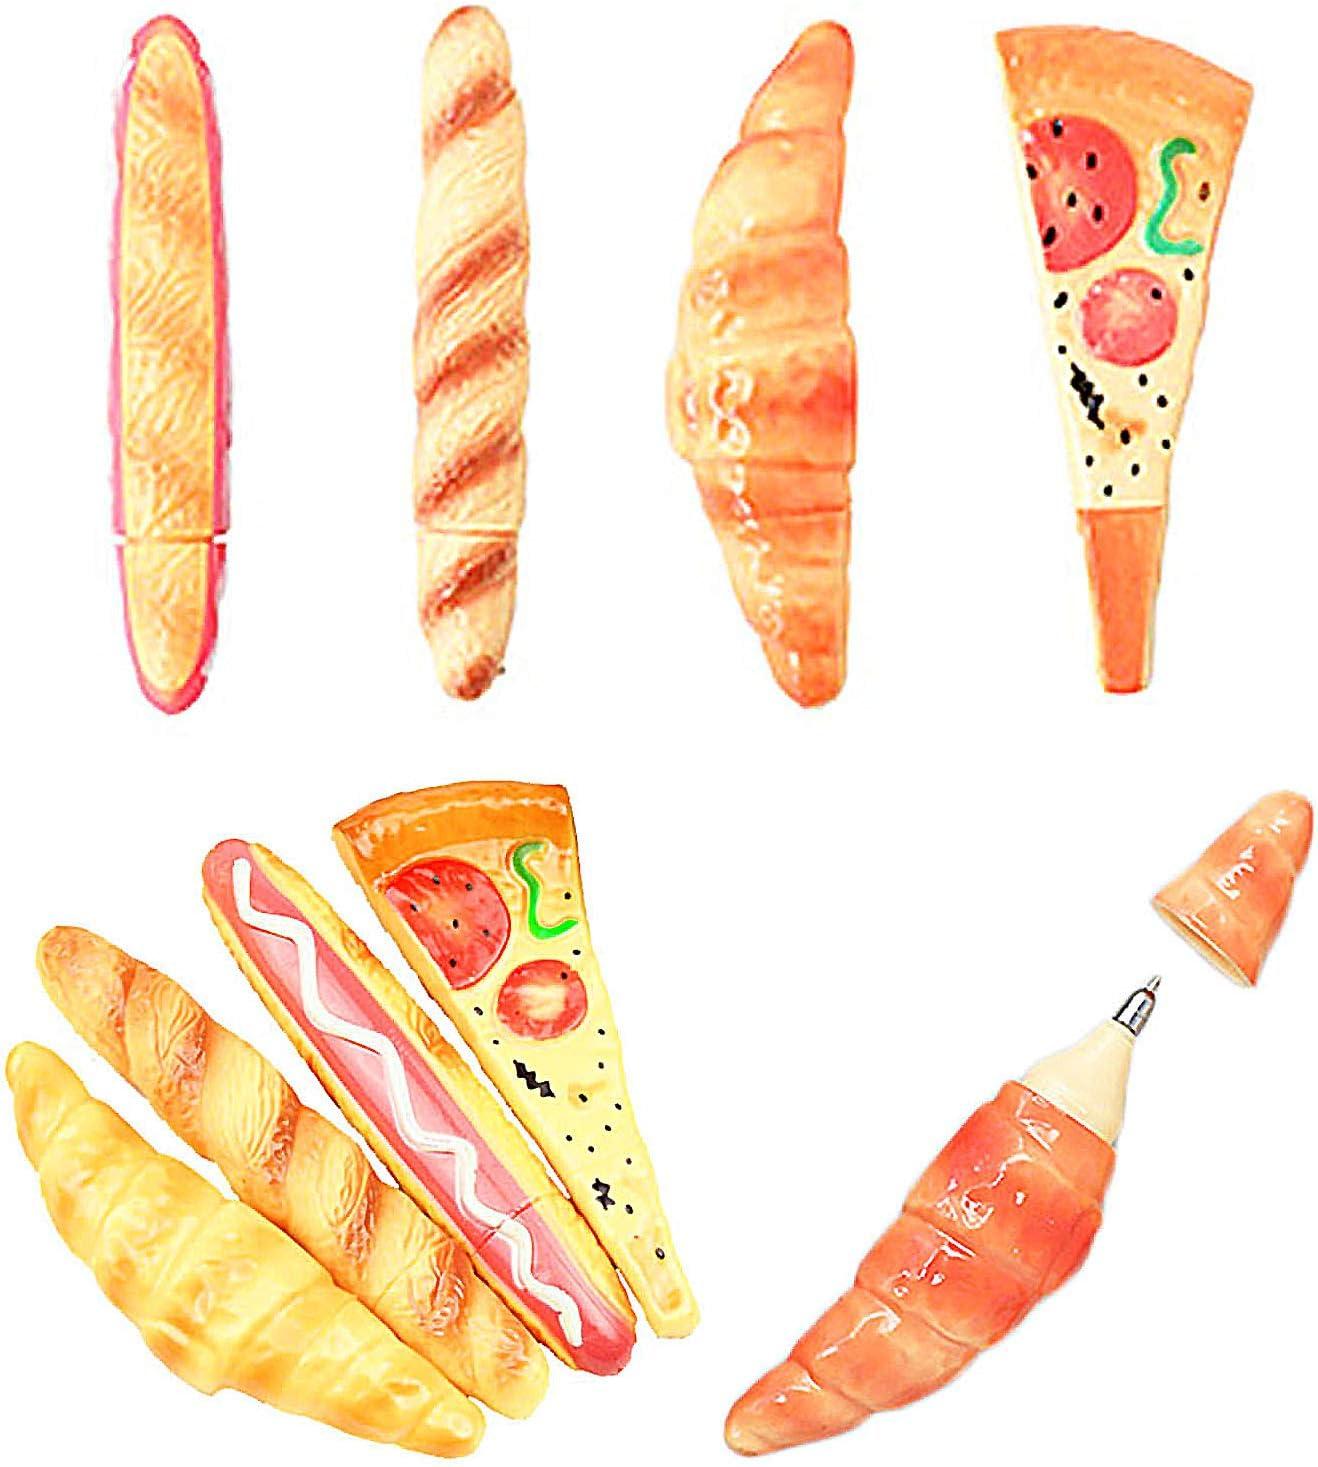 LiLiy Simulation Fast Food Black Ballpoint Pen 4Pcs,Replaceable Refill 0.5mm,Baguette Hot Dog Pizza Croissant Fridge Magnet,4.96-5.75in